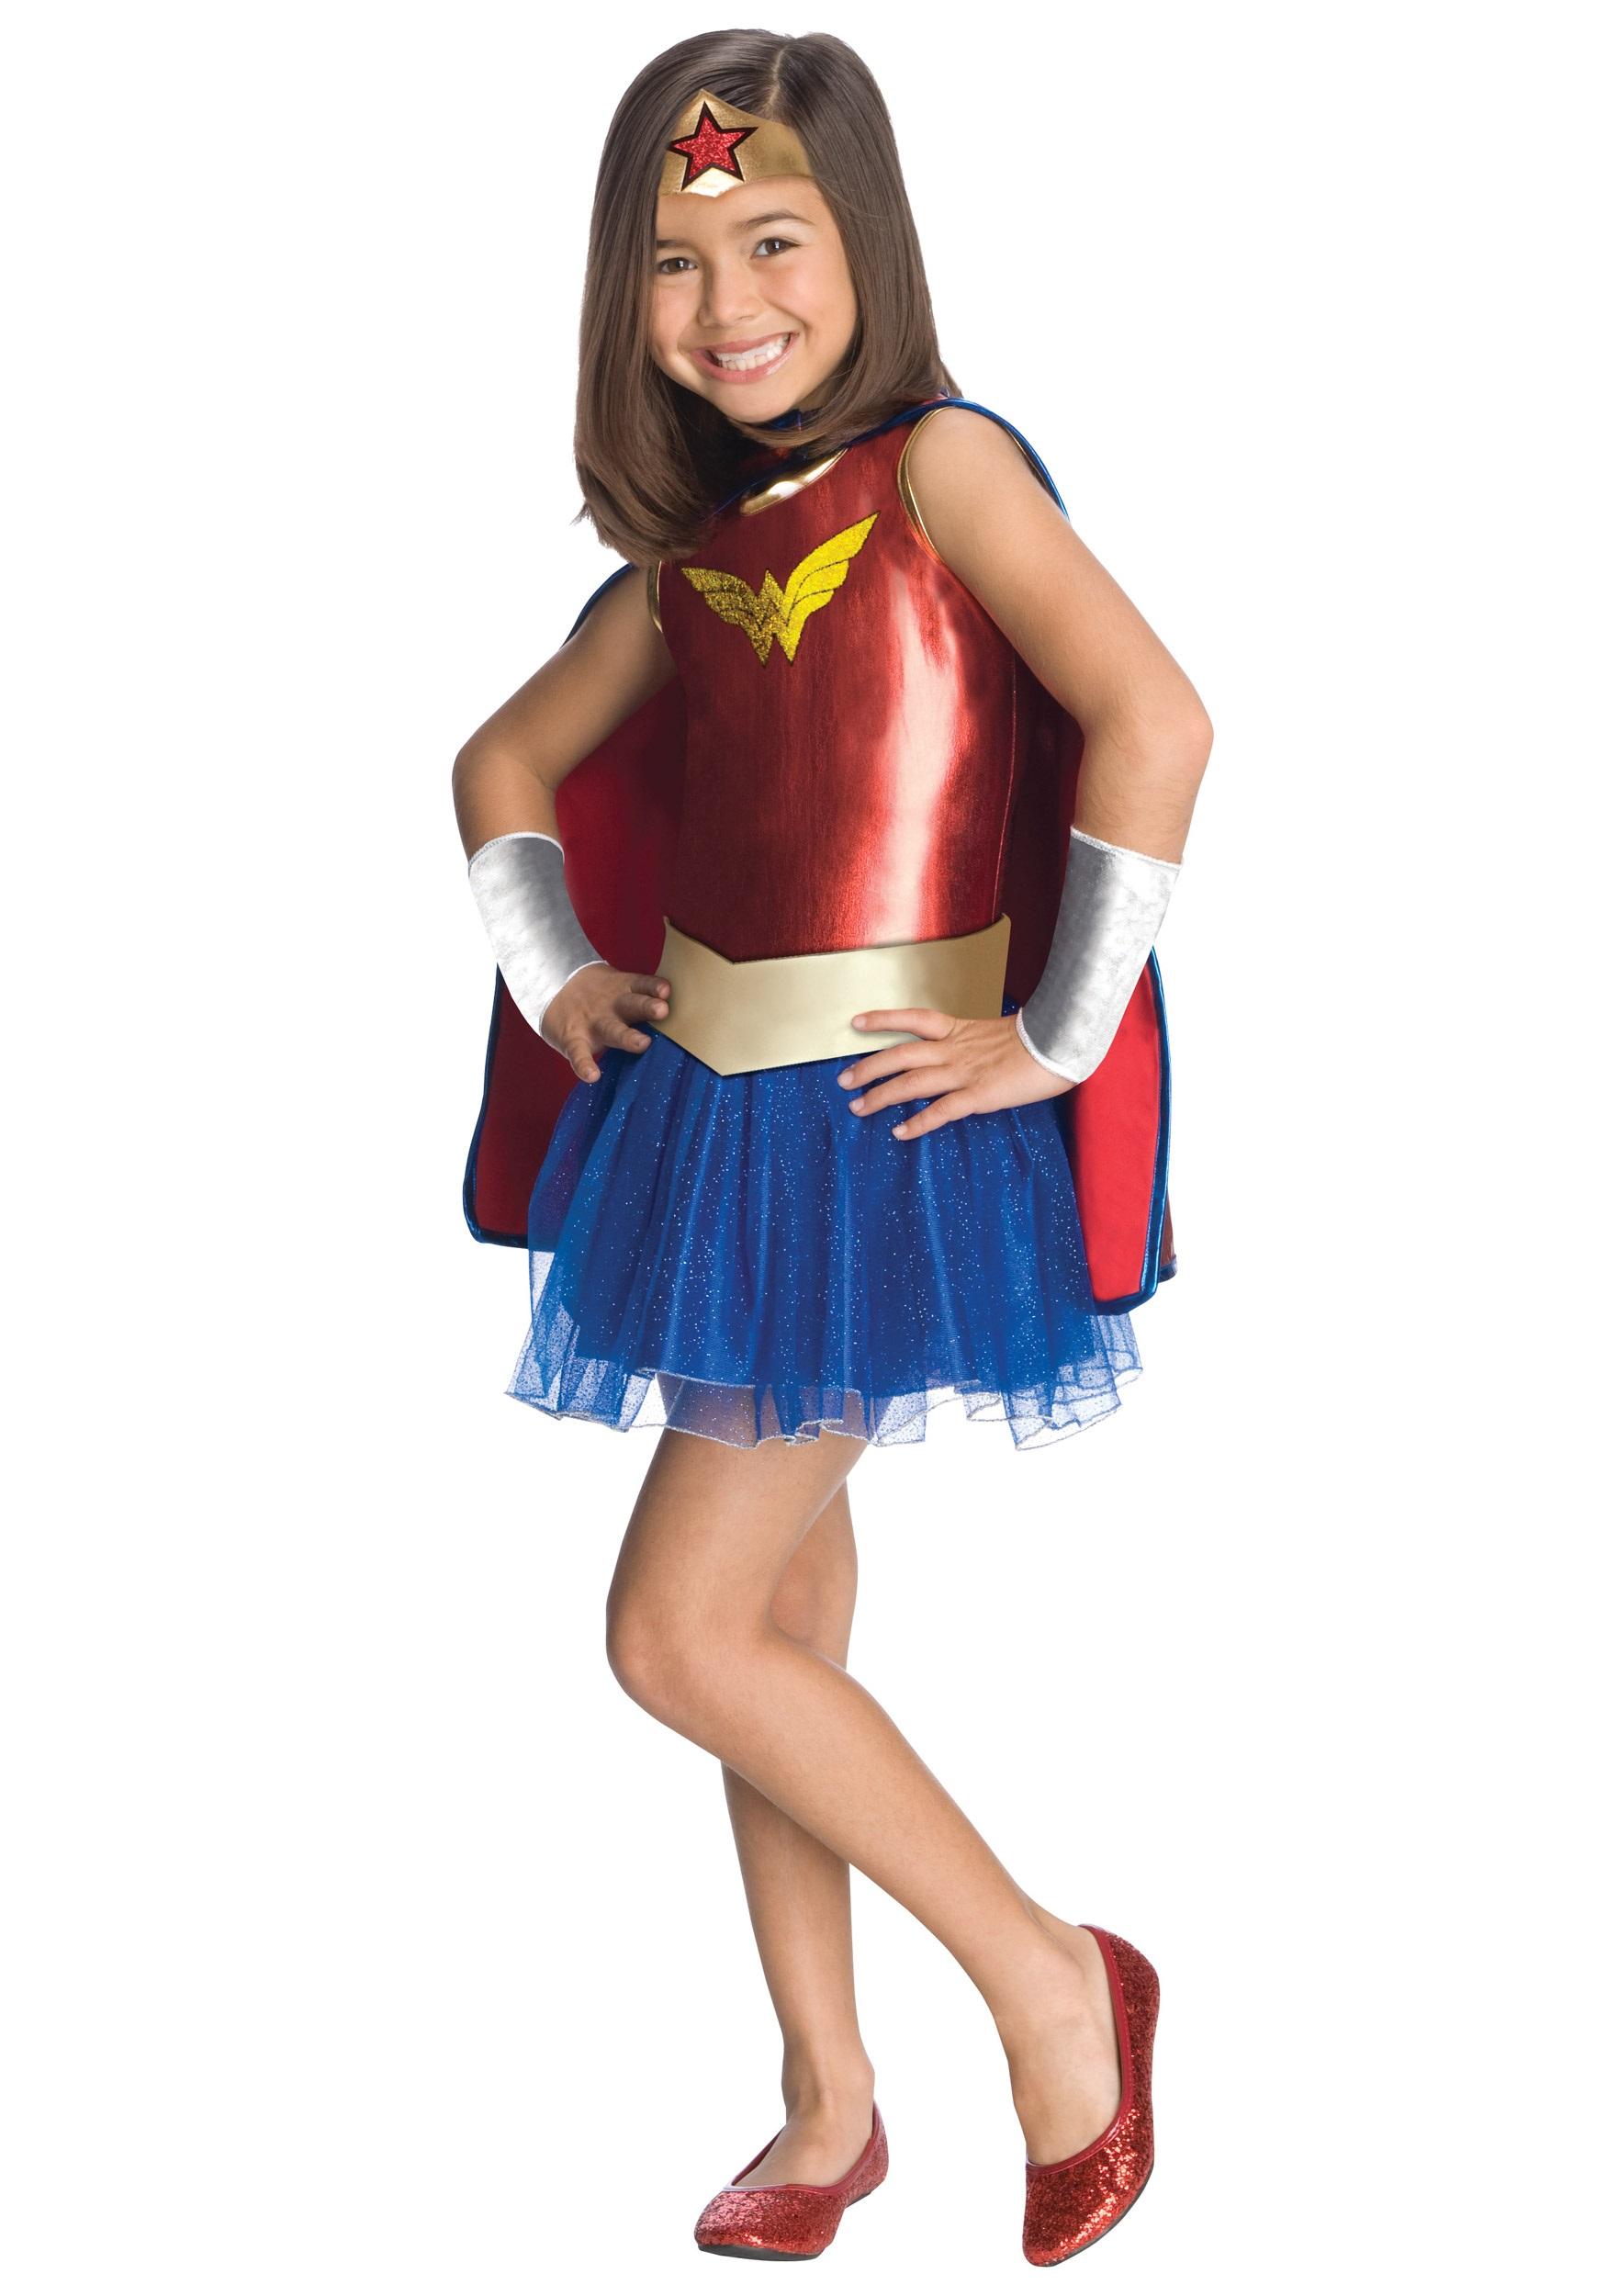 Kids Wonder Woman Tutu Costume  sc 1 st  Halloween Costumes & Kids Wonder Woman Tutu Costume - Halloween Costumes